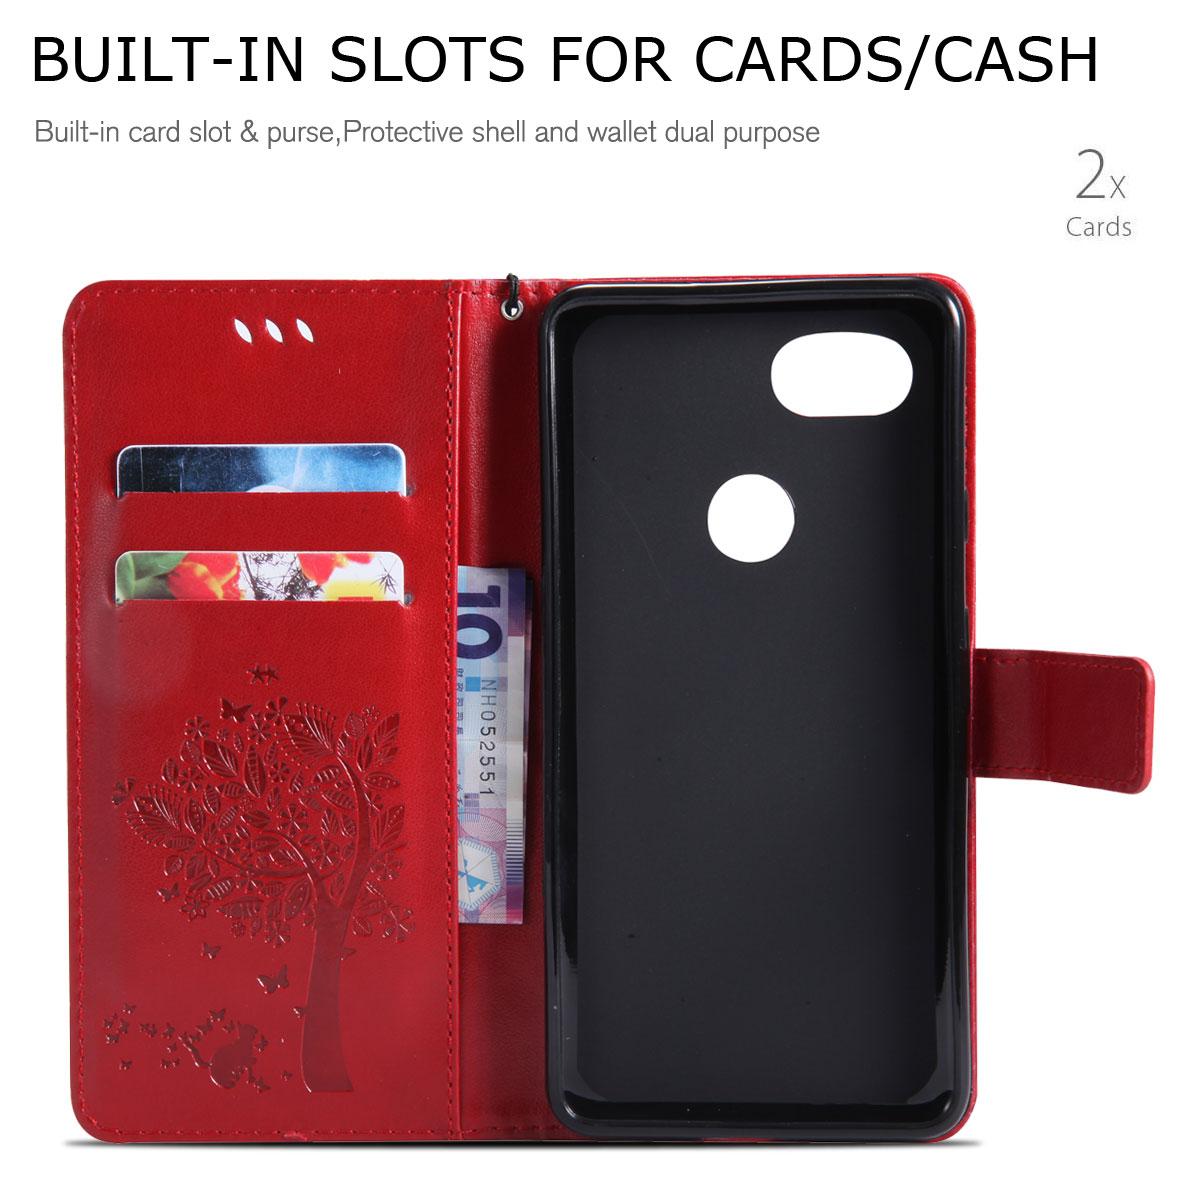 Magnetic-Leather-Credit-Card-Holder-Flip-Case-Cover-For-Google-Pixel-2-2-XL thumbnail 62